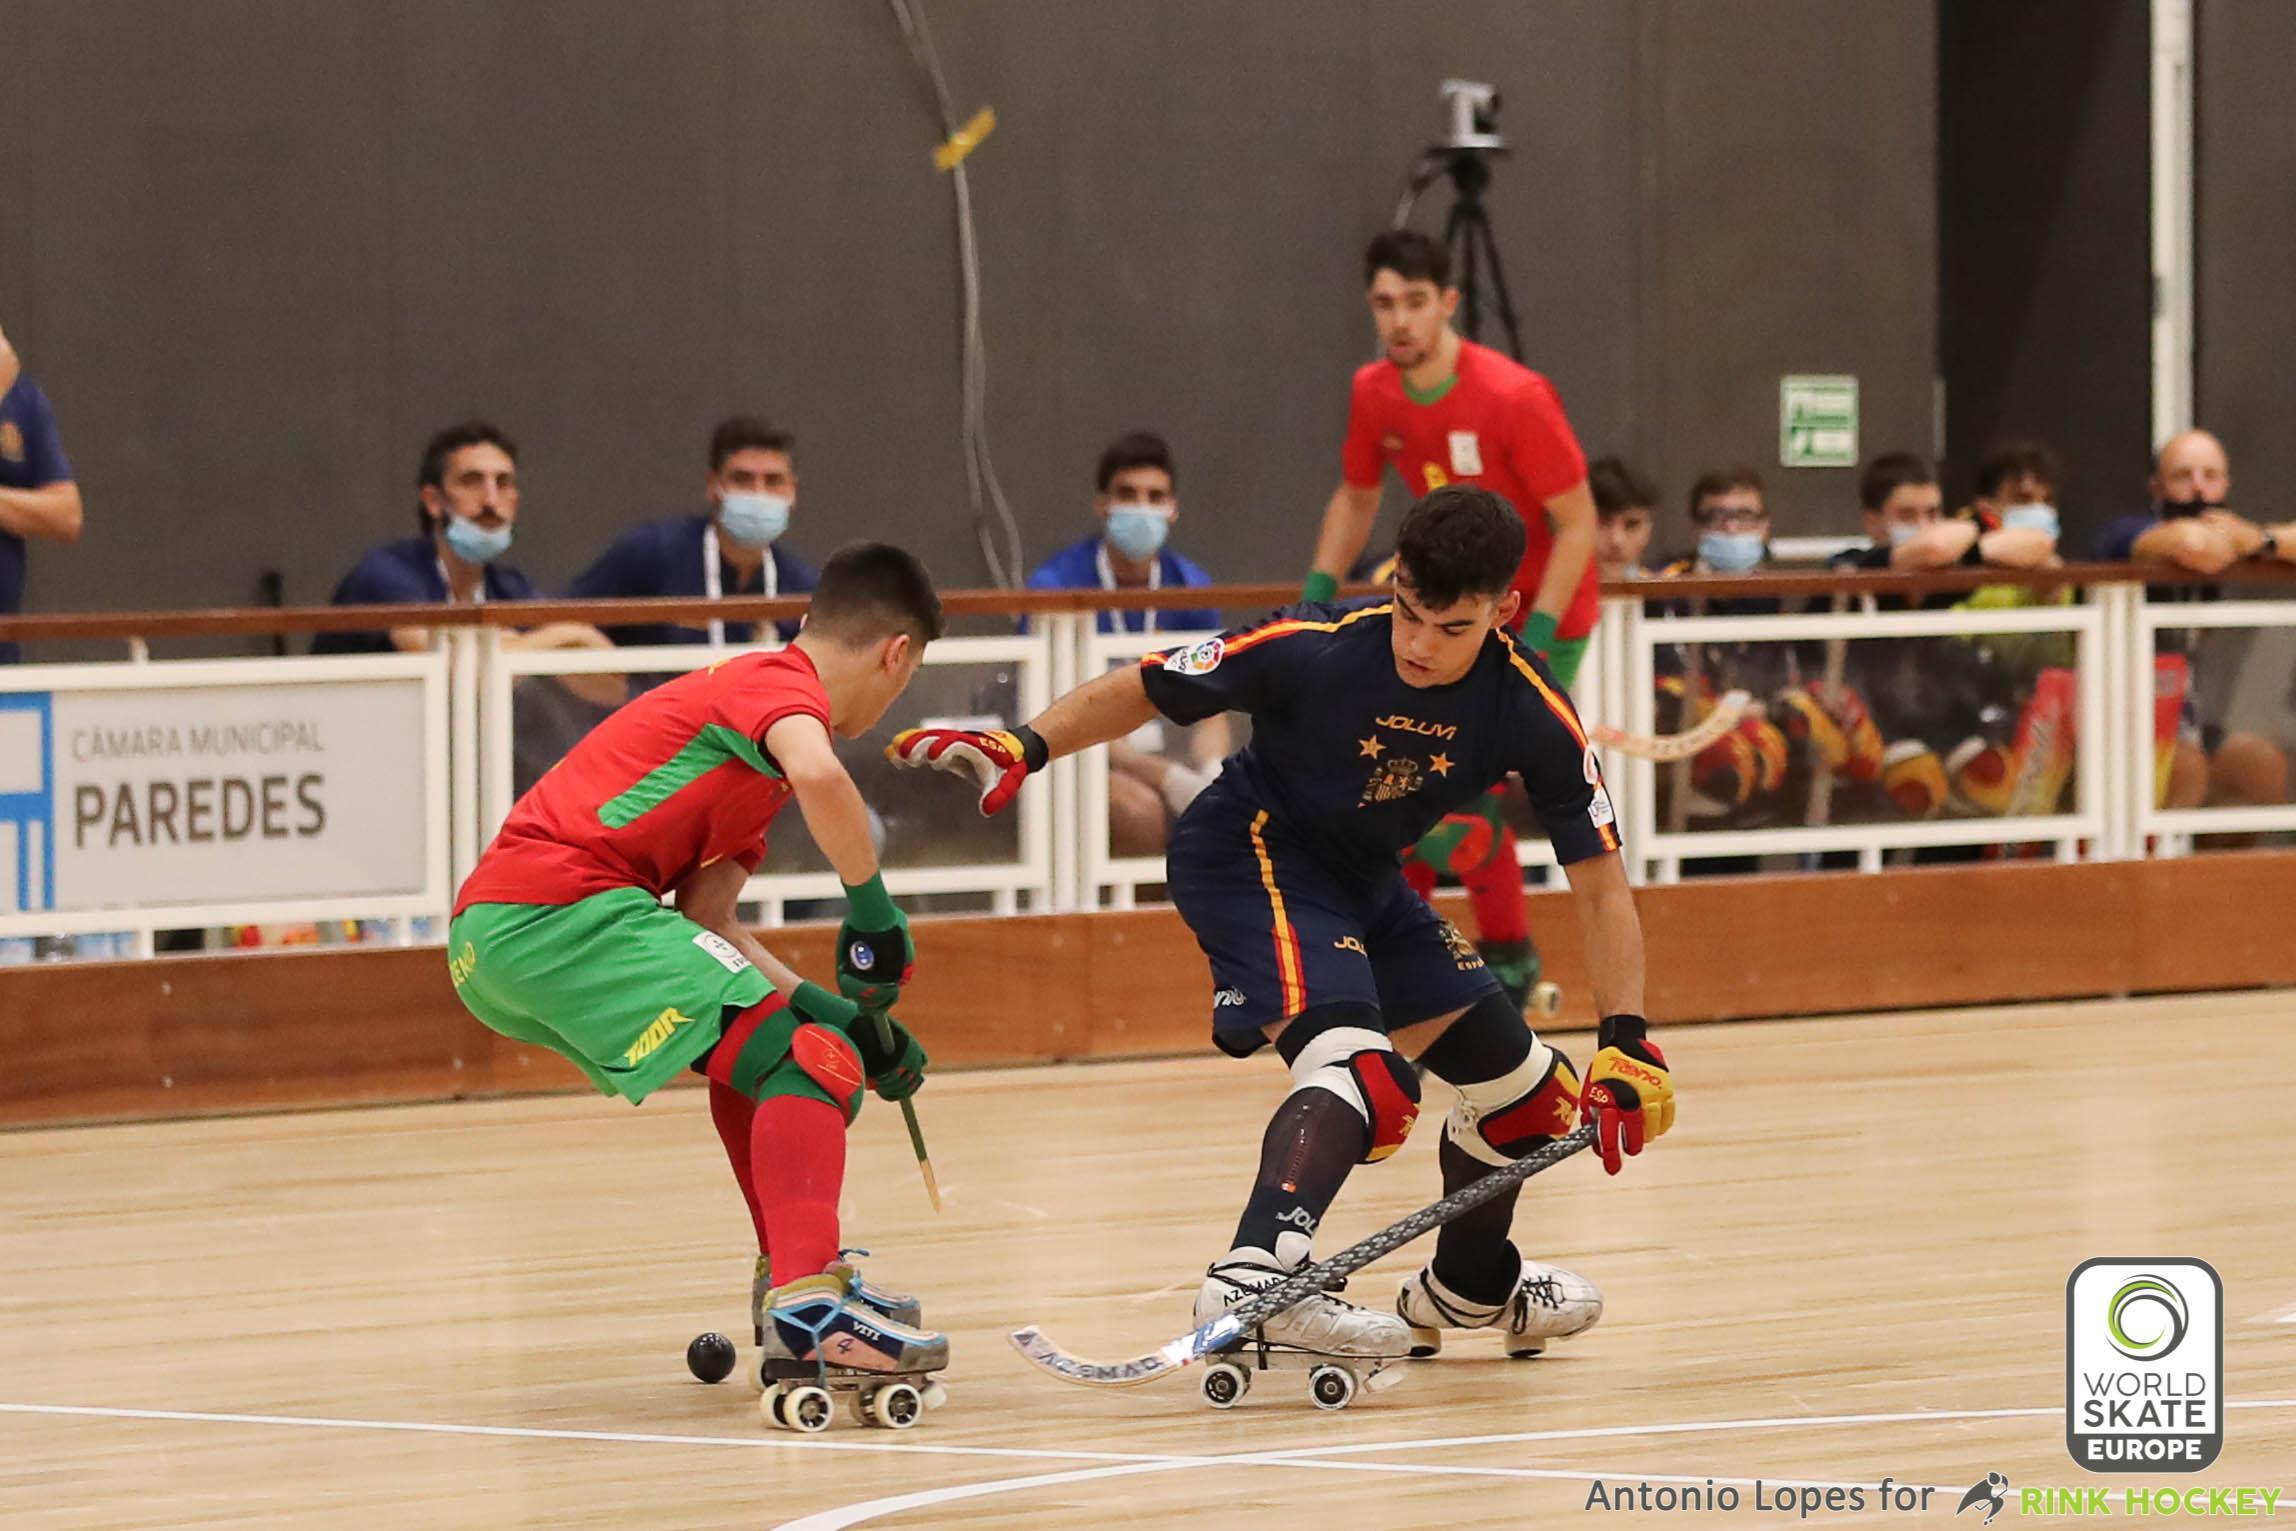 PHOTOS - 11-09-2021 - EURO U17 - PAREDES 2021 - Match #223 - Portugal x Spain